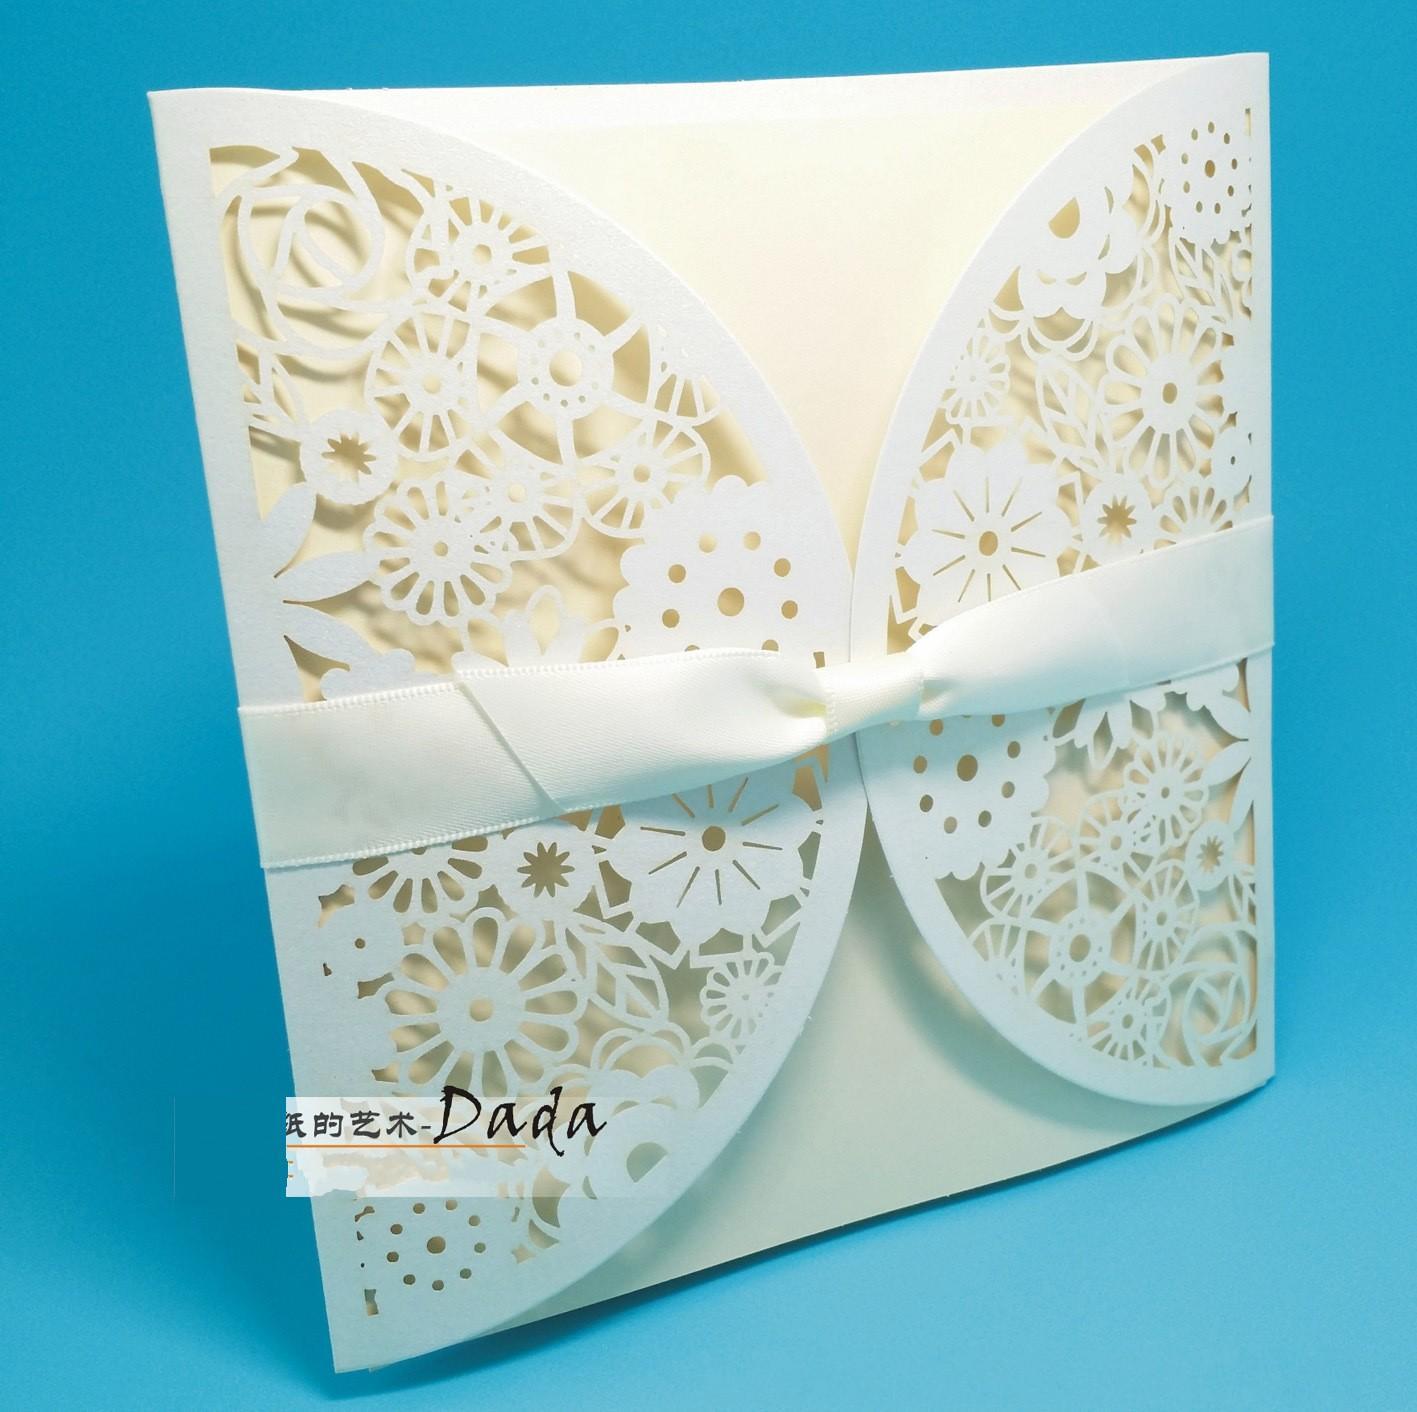 Cheap Unique Wedding Invitations: Wholesale Unique Wedding Invitations Cards High Quality